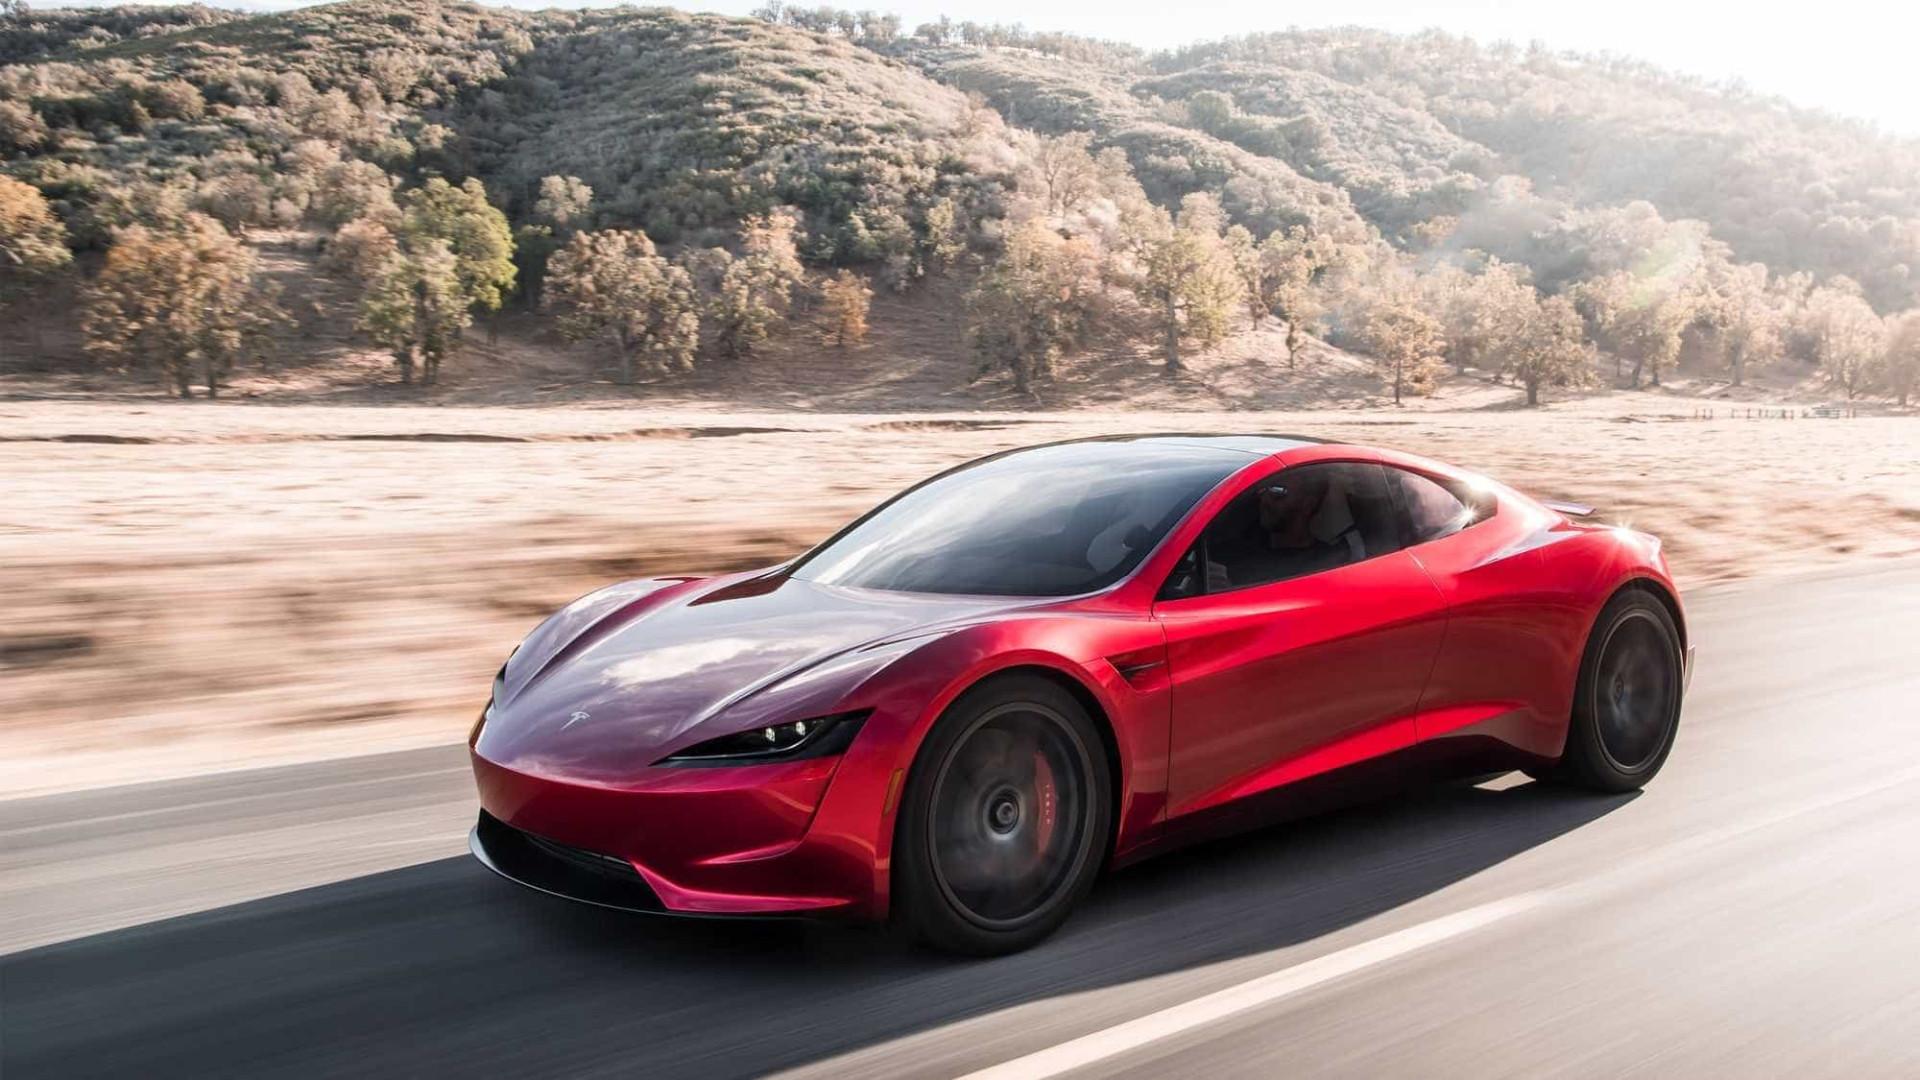 Tesla Roadster será capaz de voar? Musk garante que sim